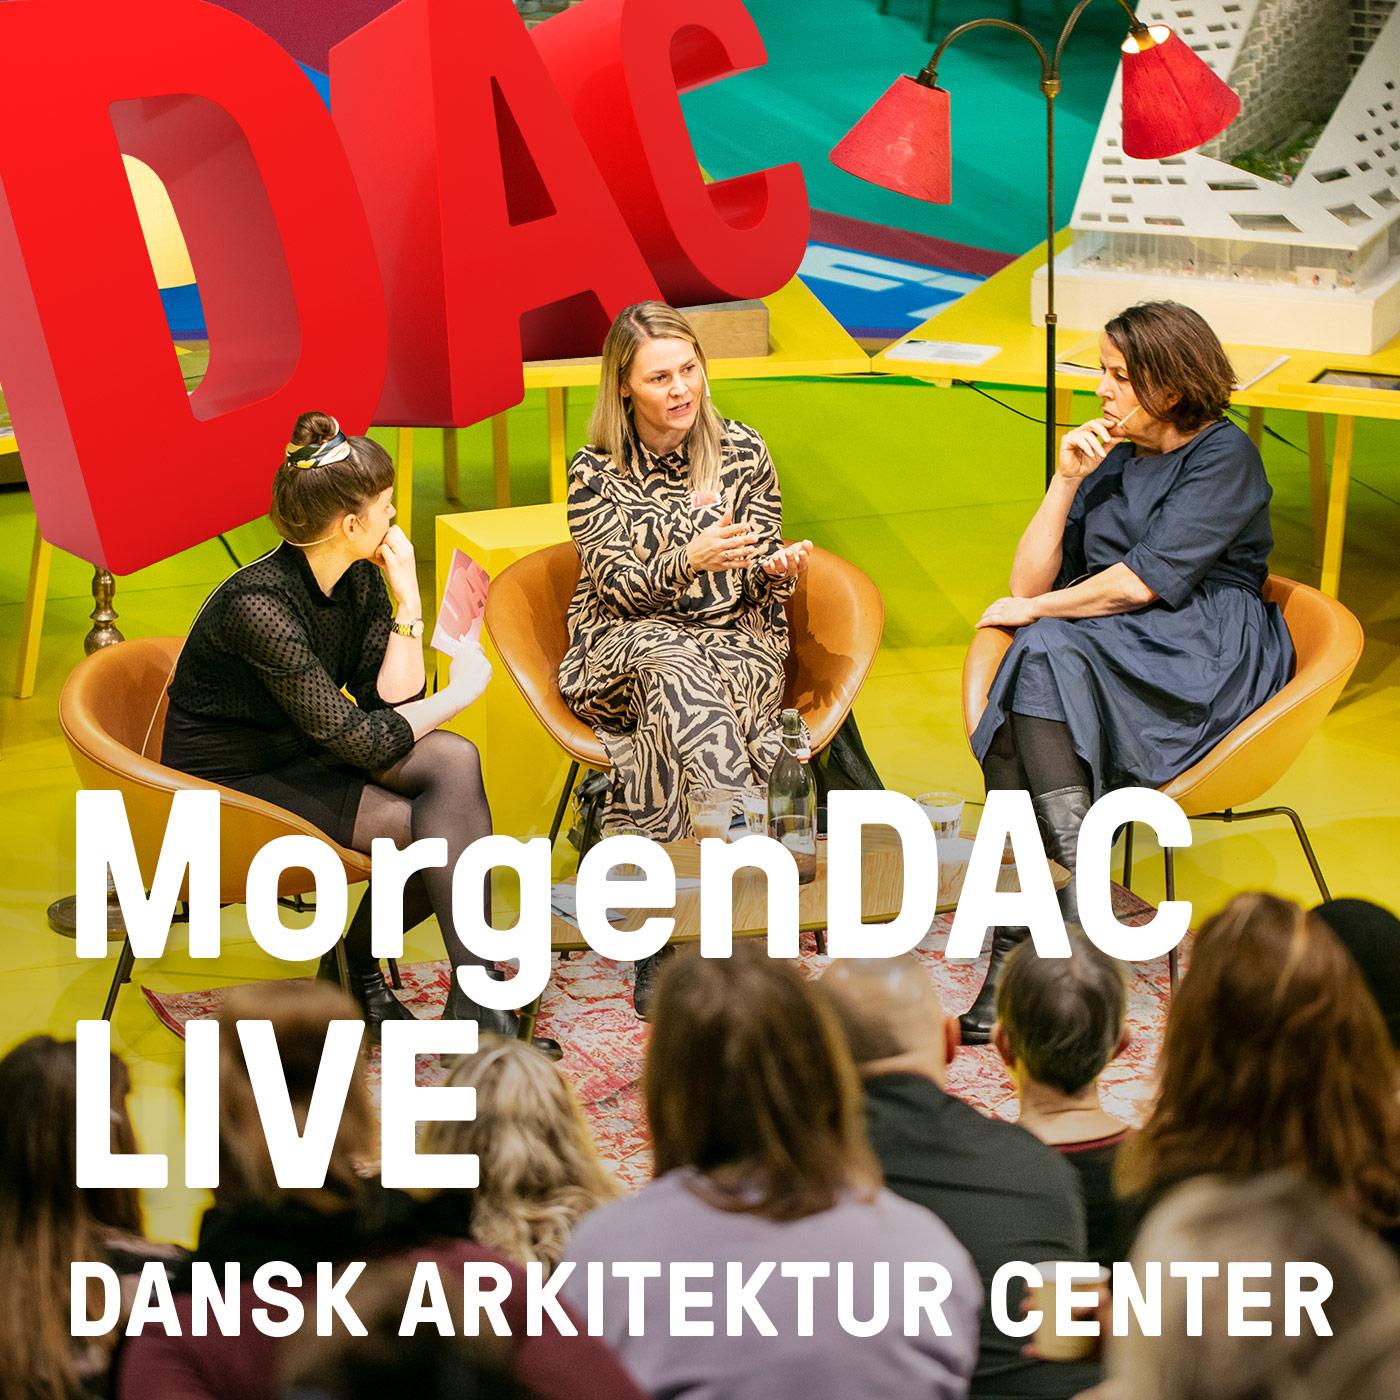 MorgenDAC LIVE show art